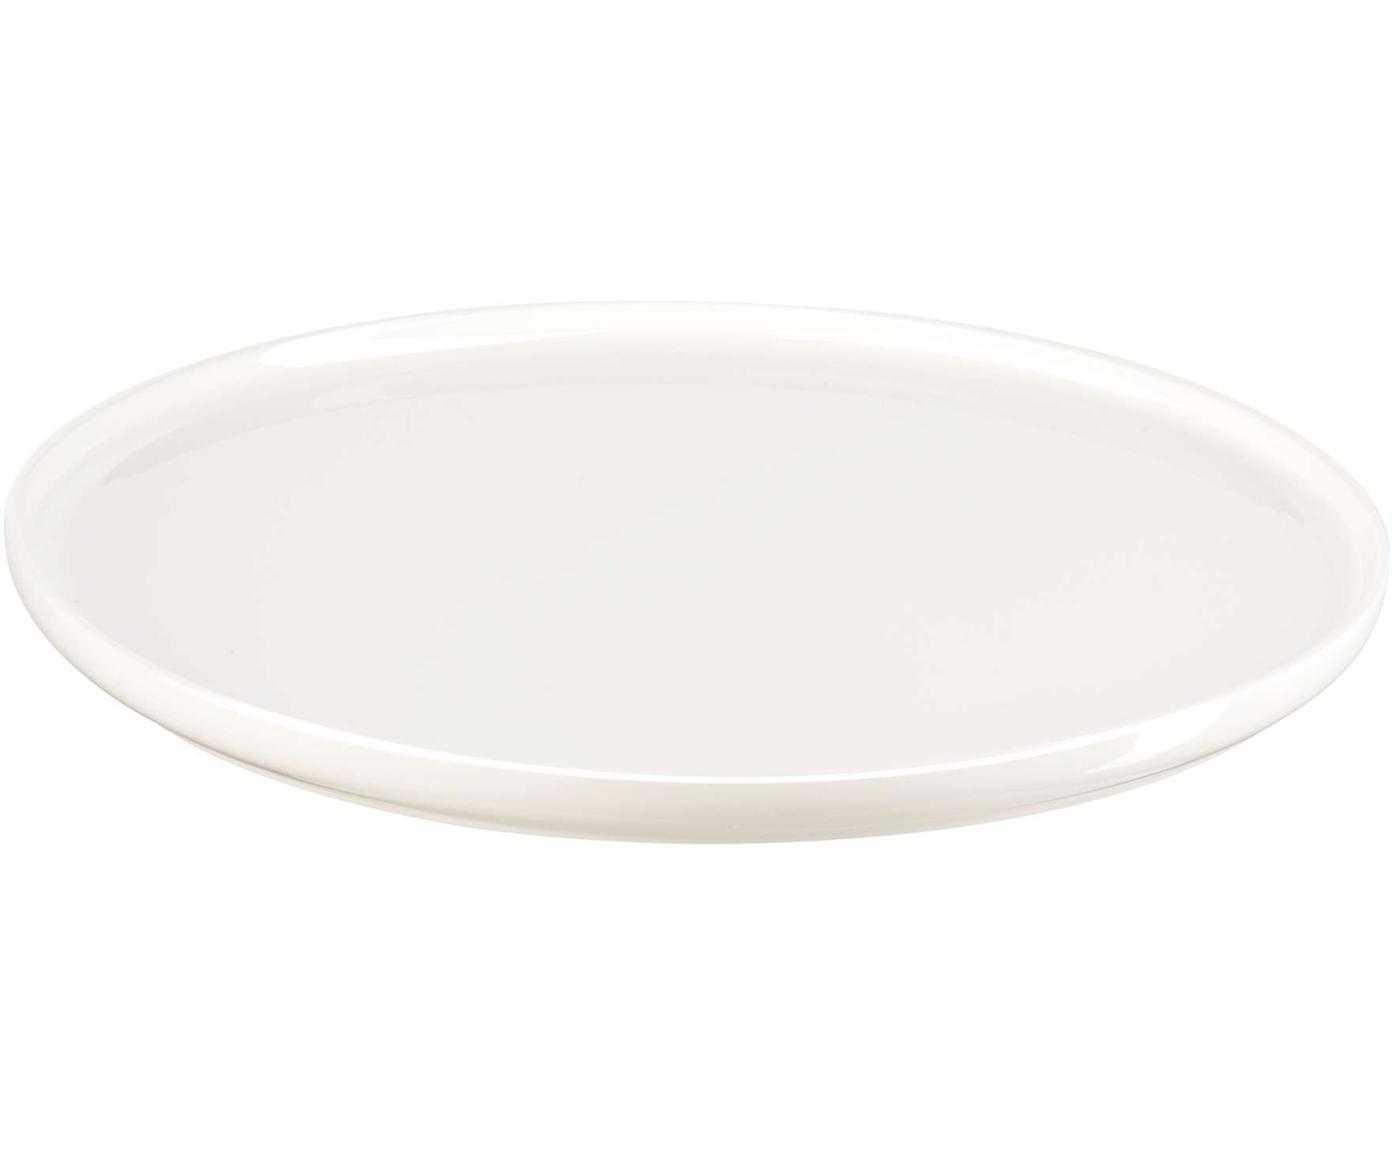 Piatto da colazione Oco 6 pz, Porcellana Fine Bone China, Bianco, Ø 21 cm